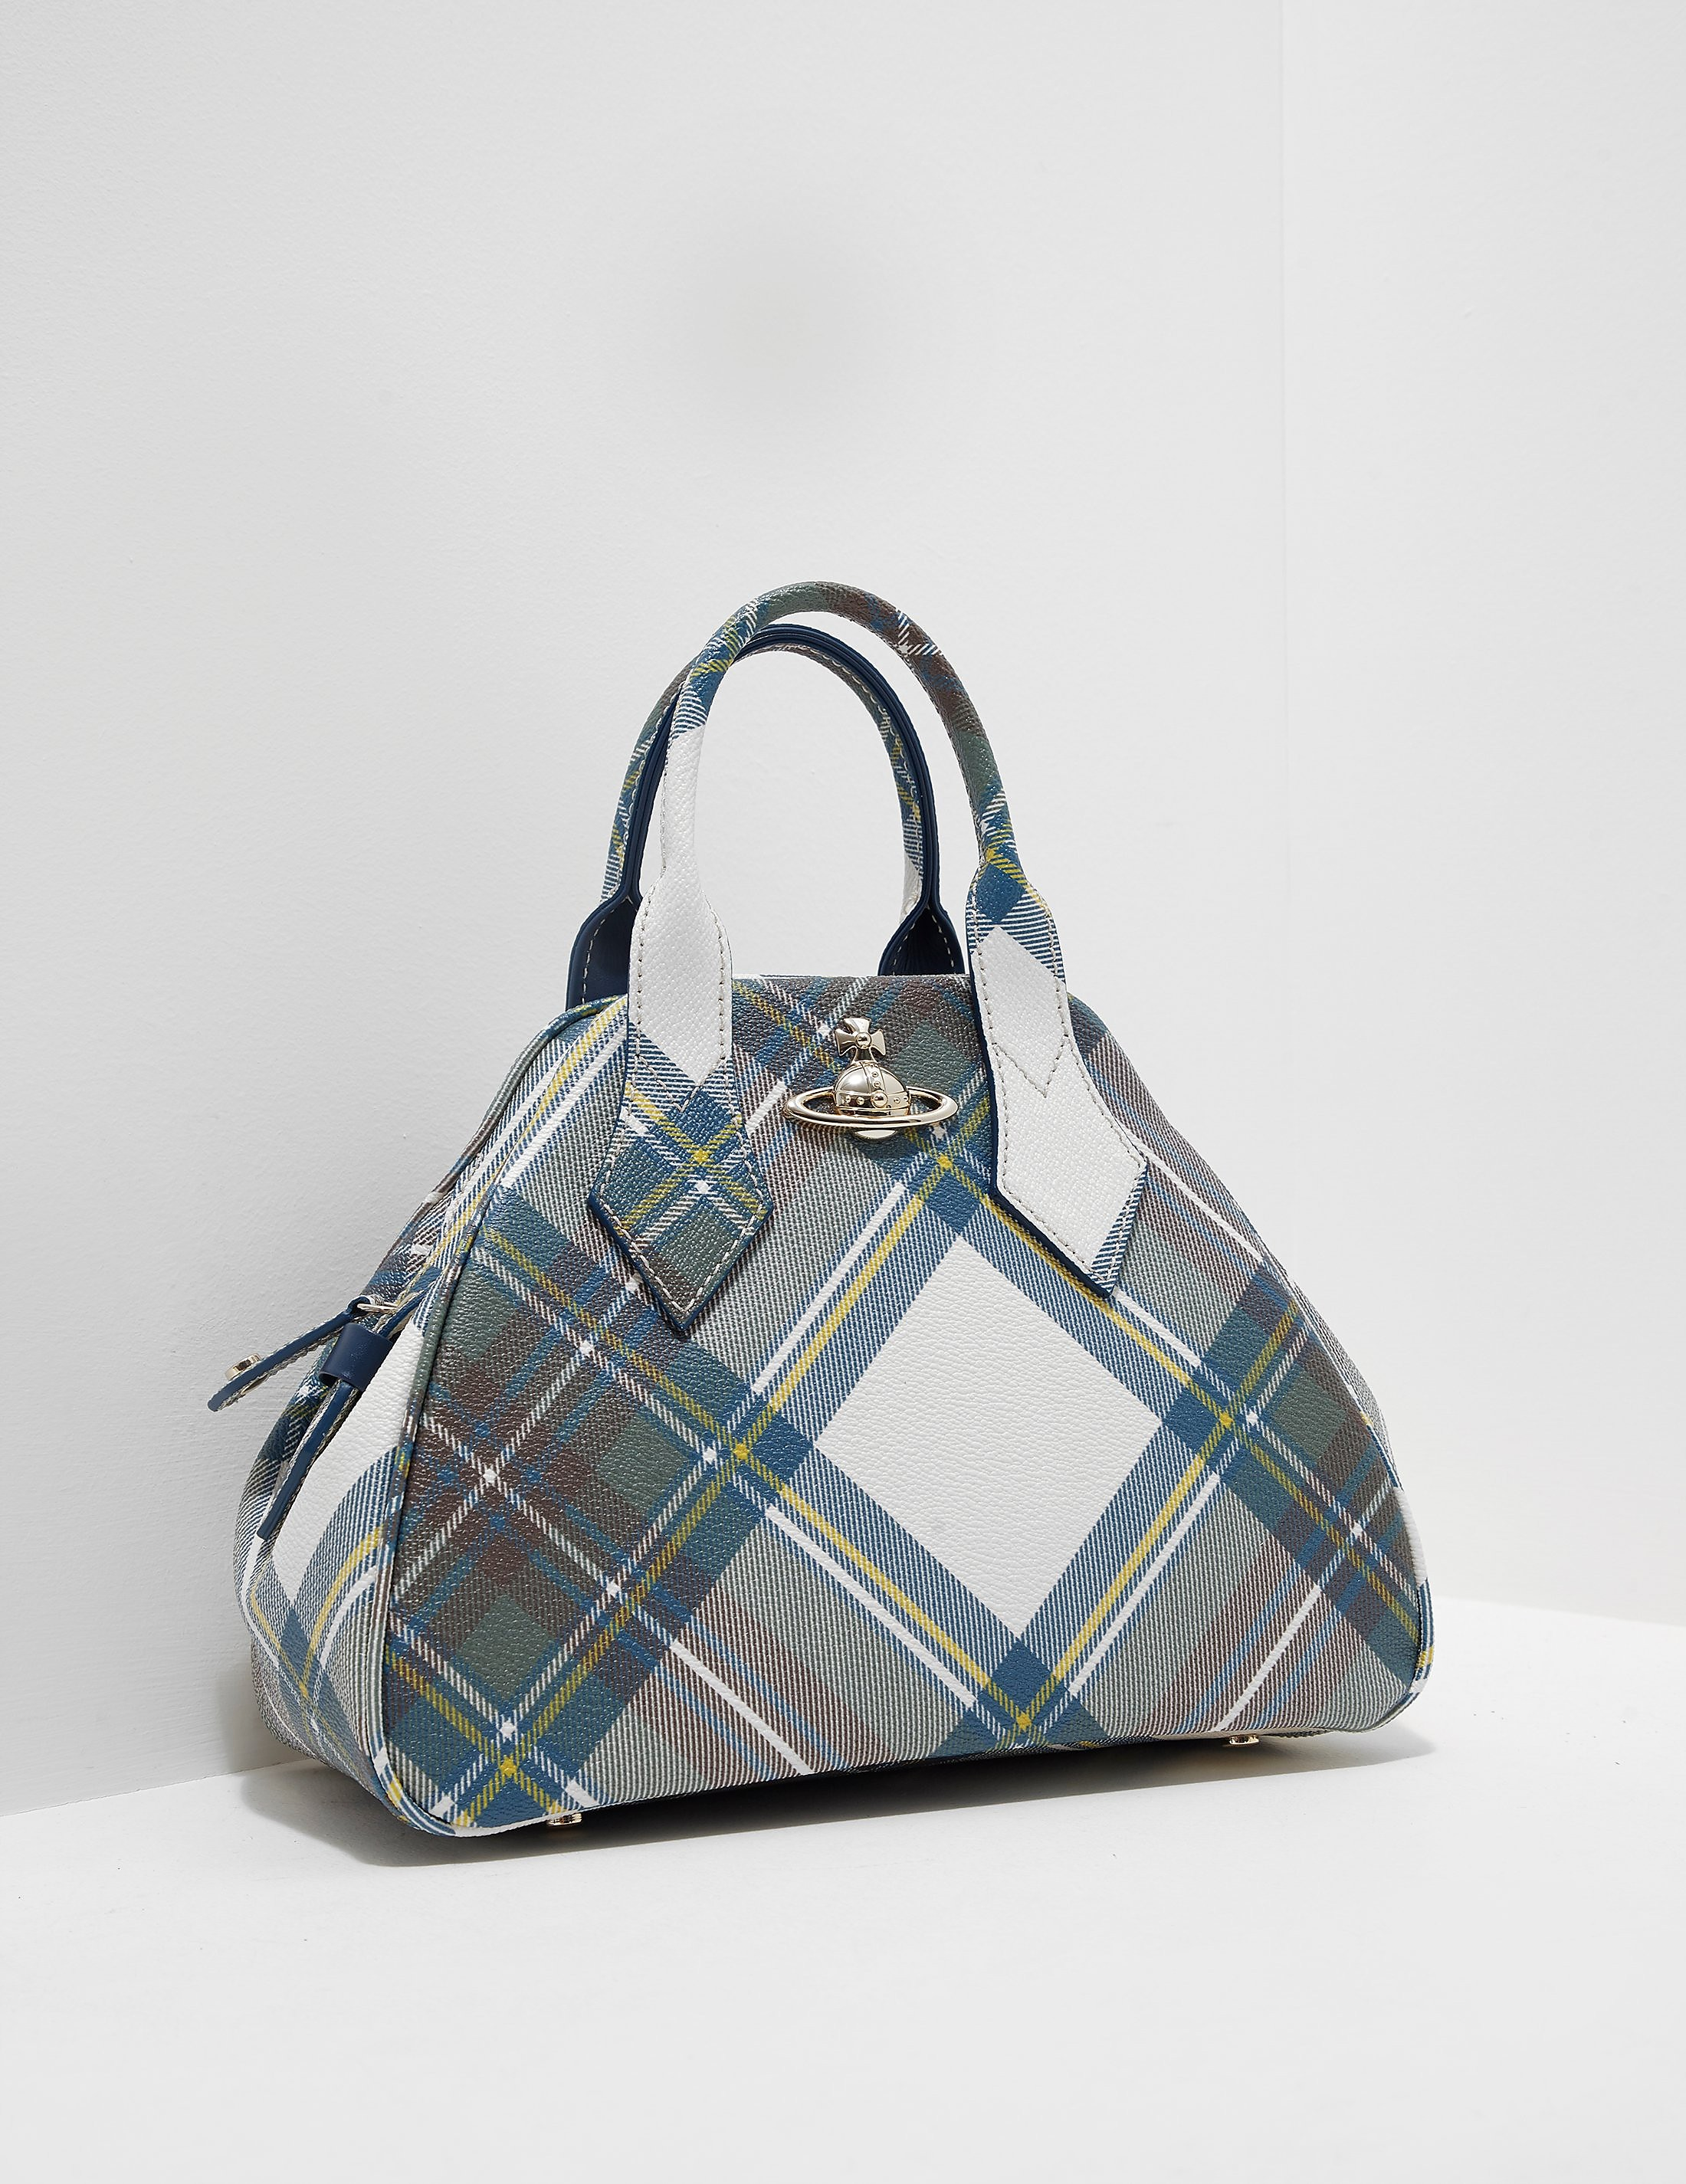 Vivienne Westwood Derby Medium Dome Bag